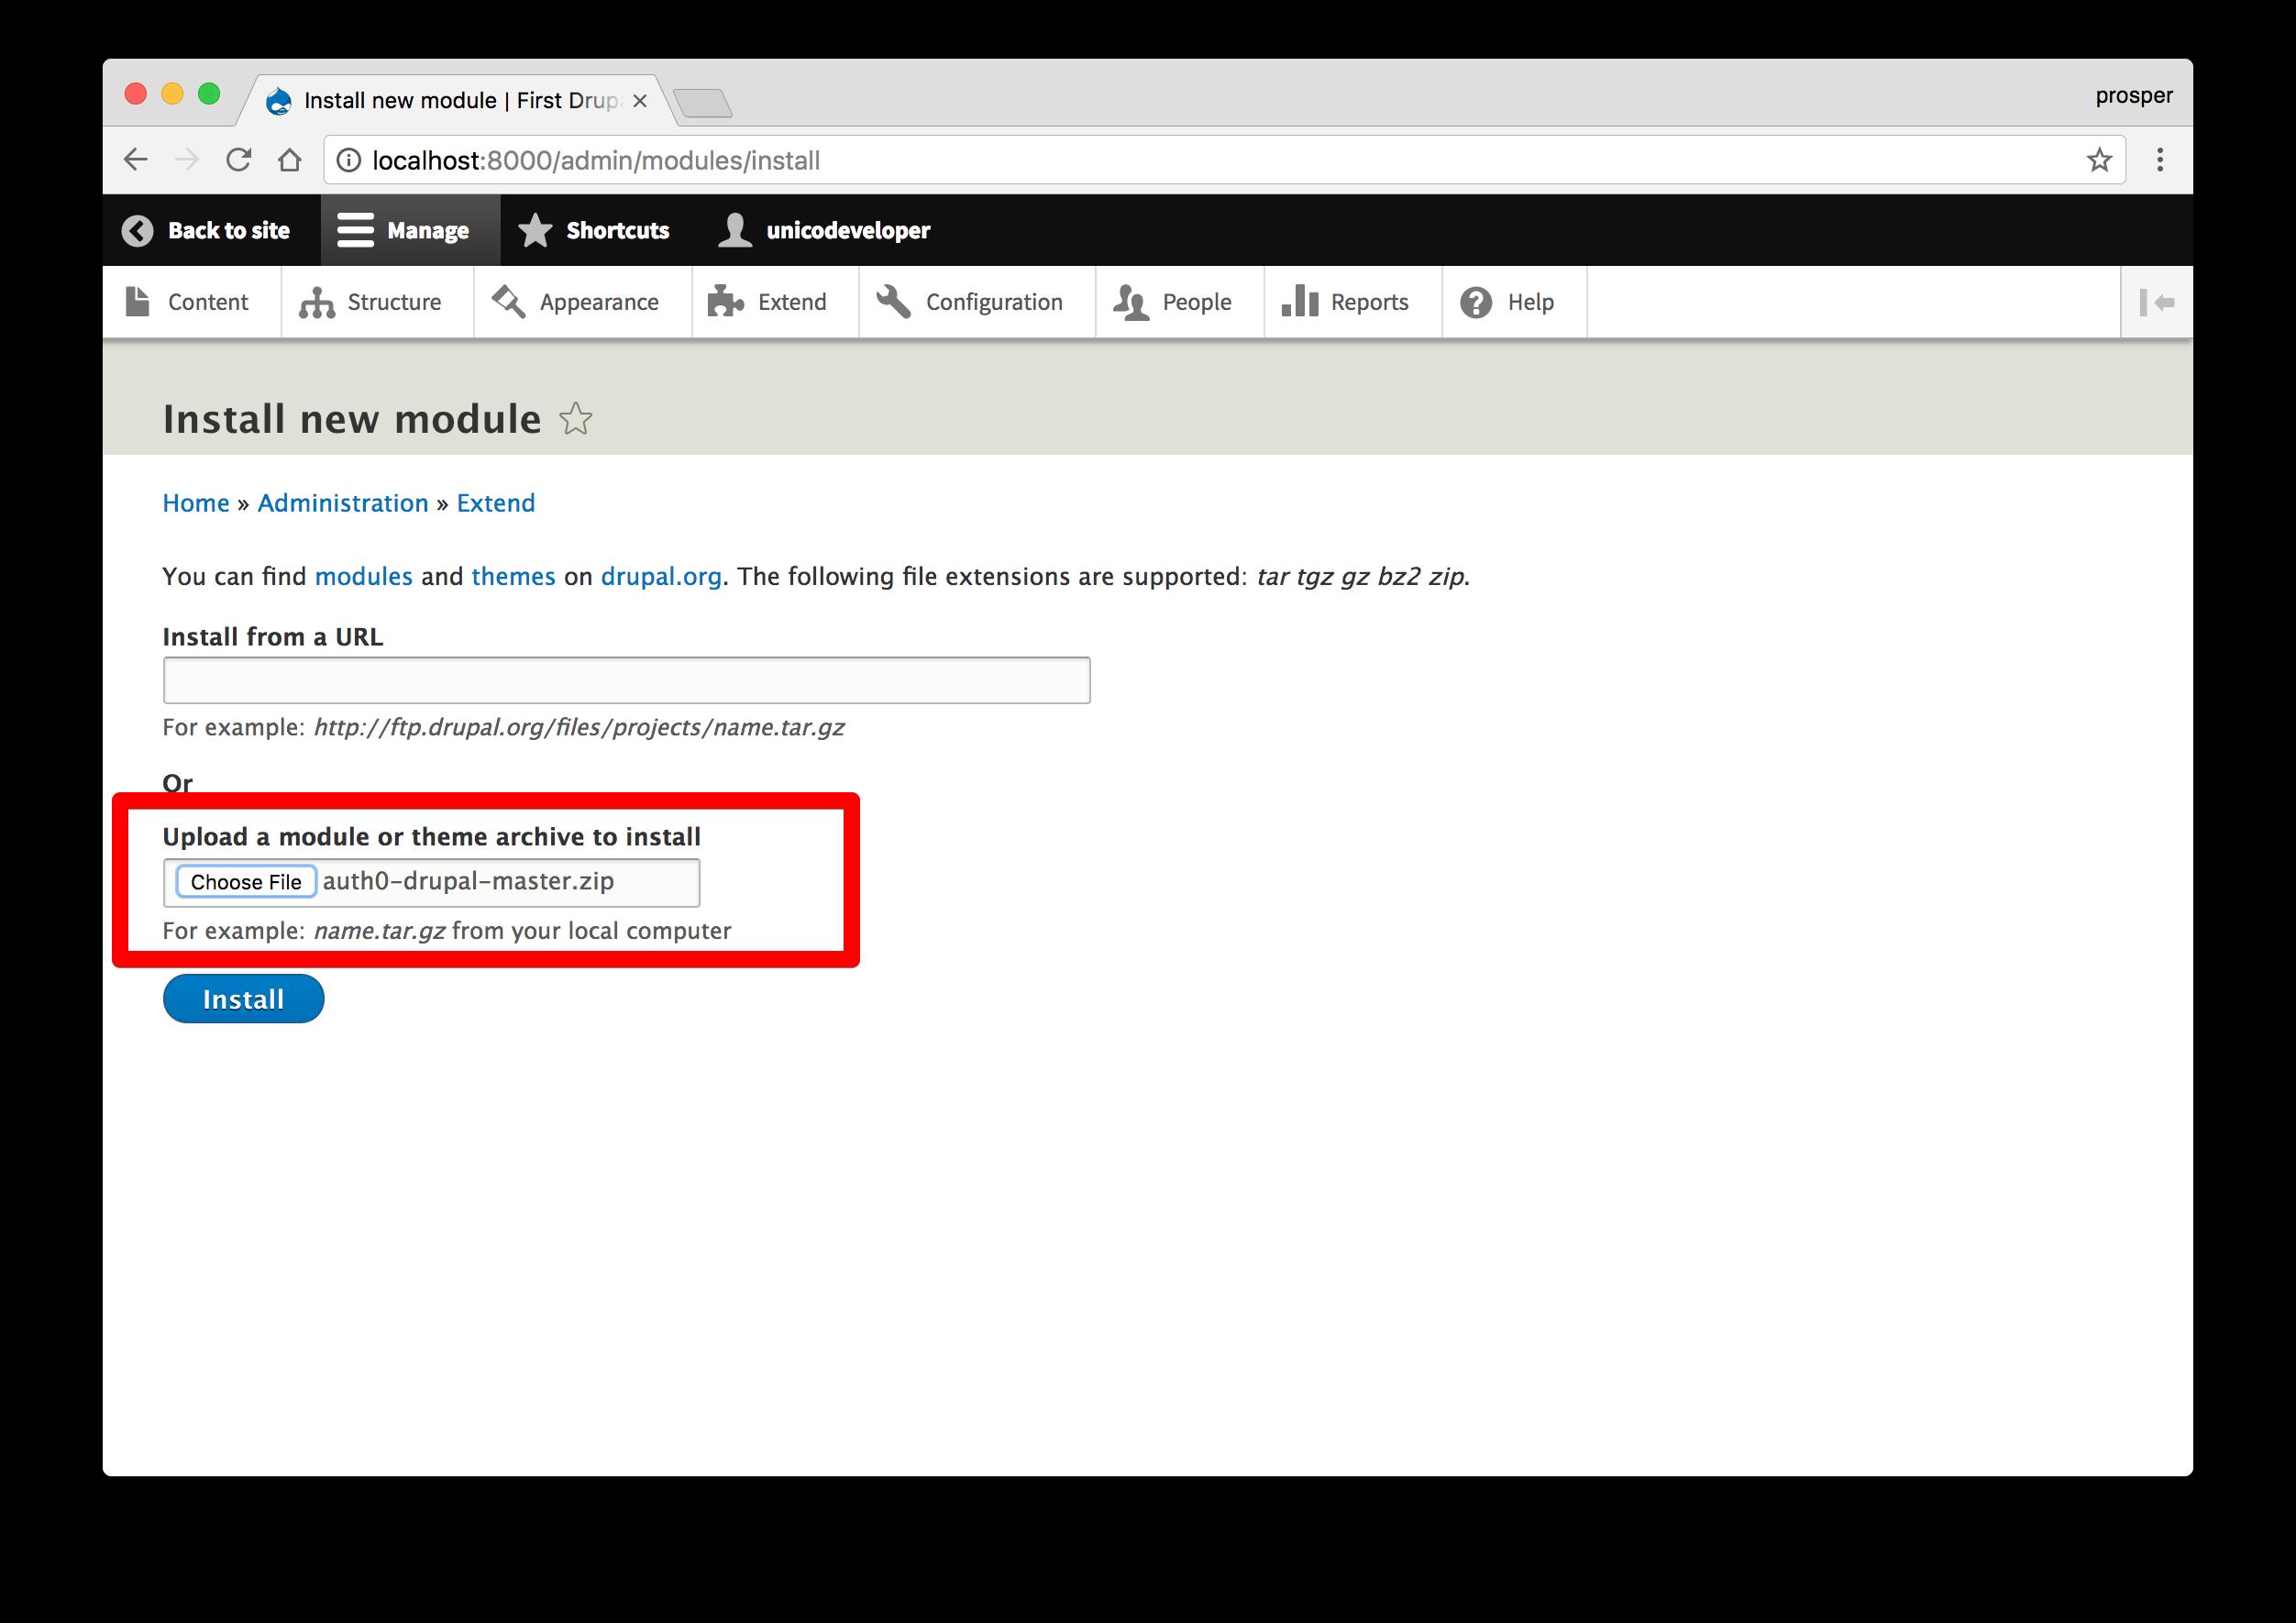 Install auth0 drupal plugin